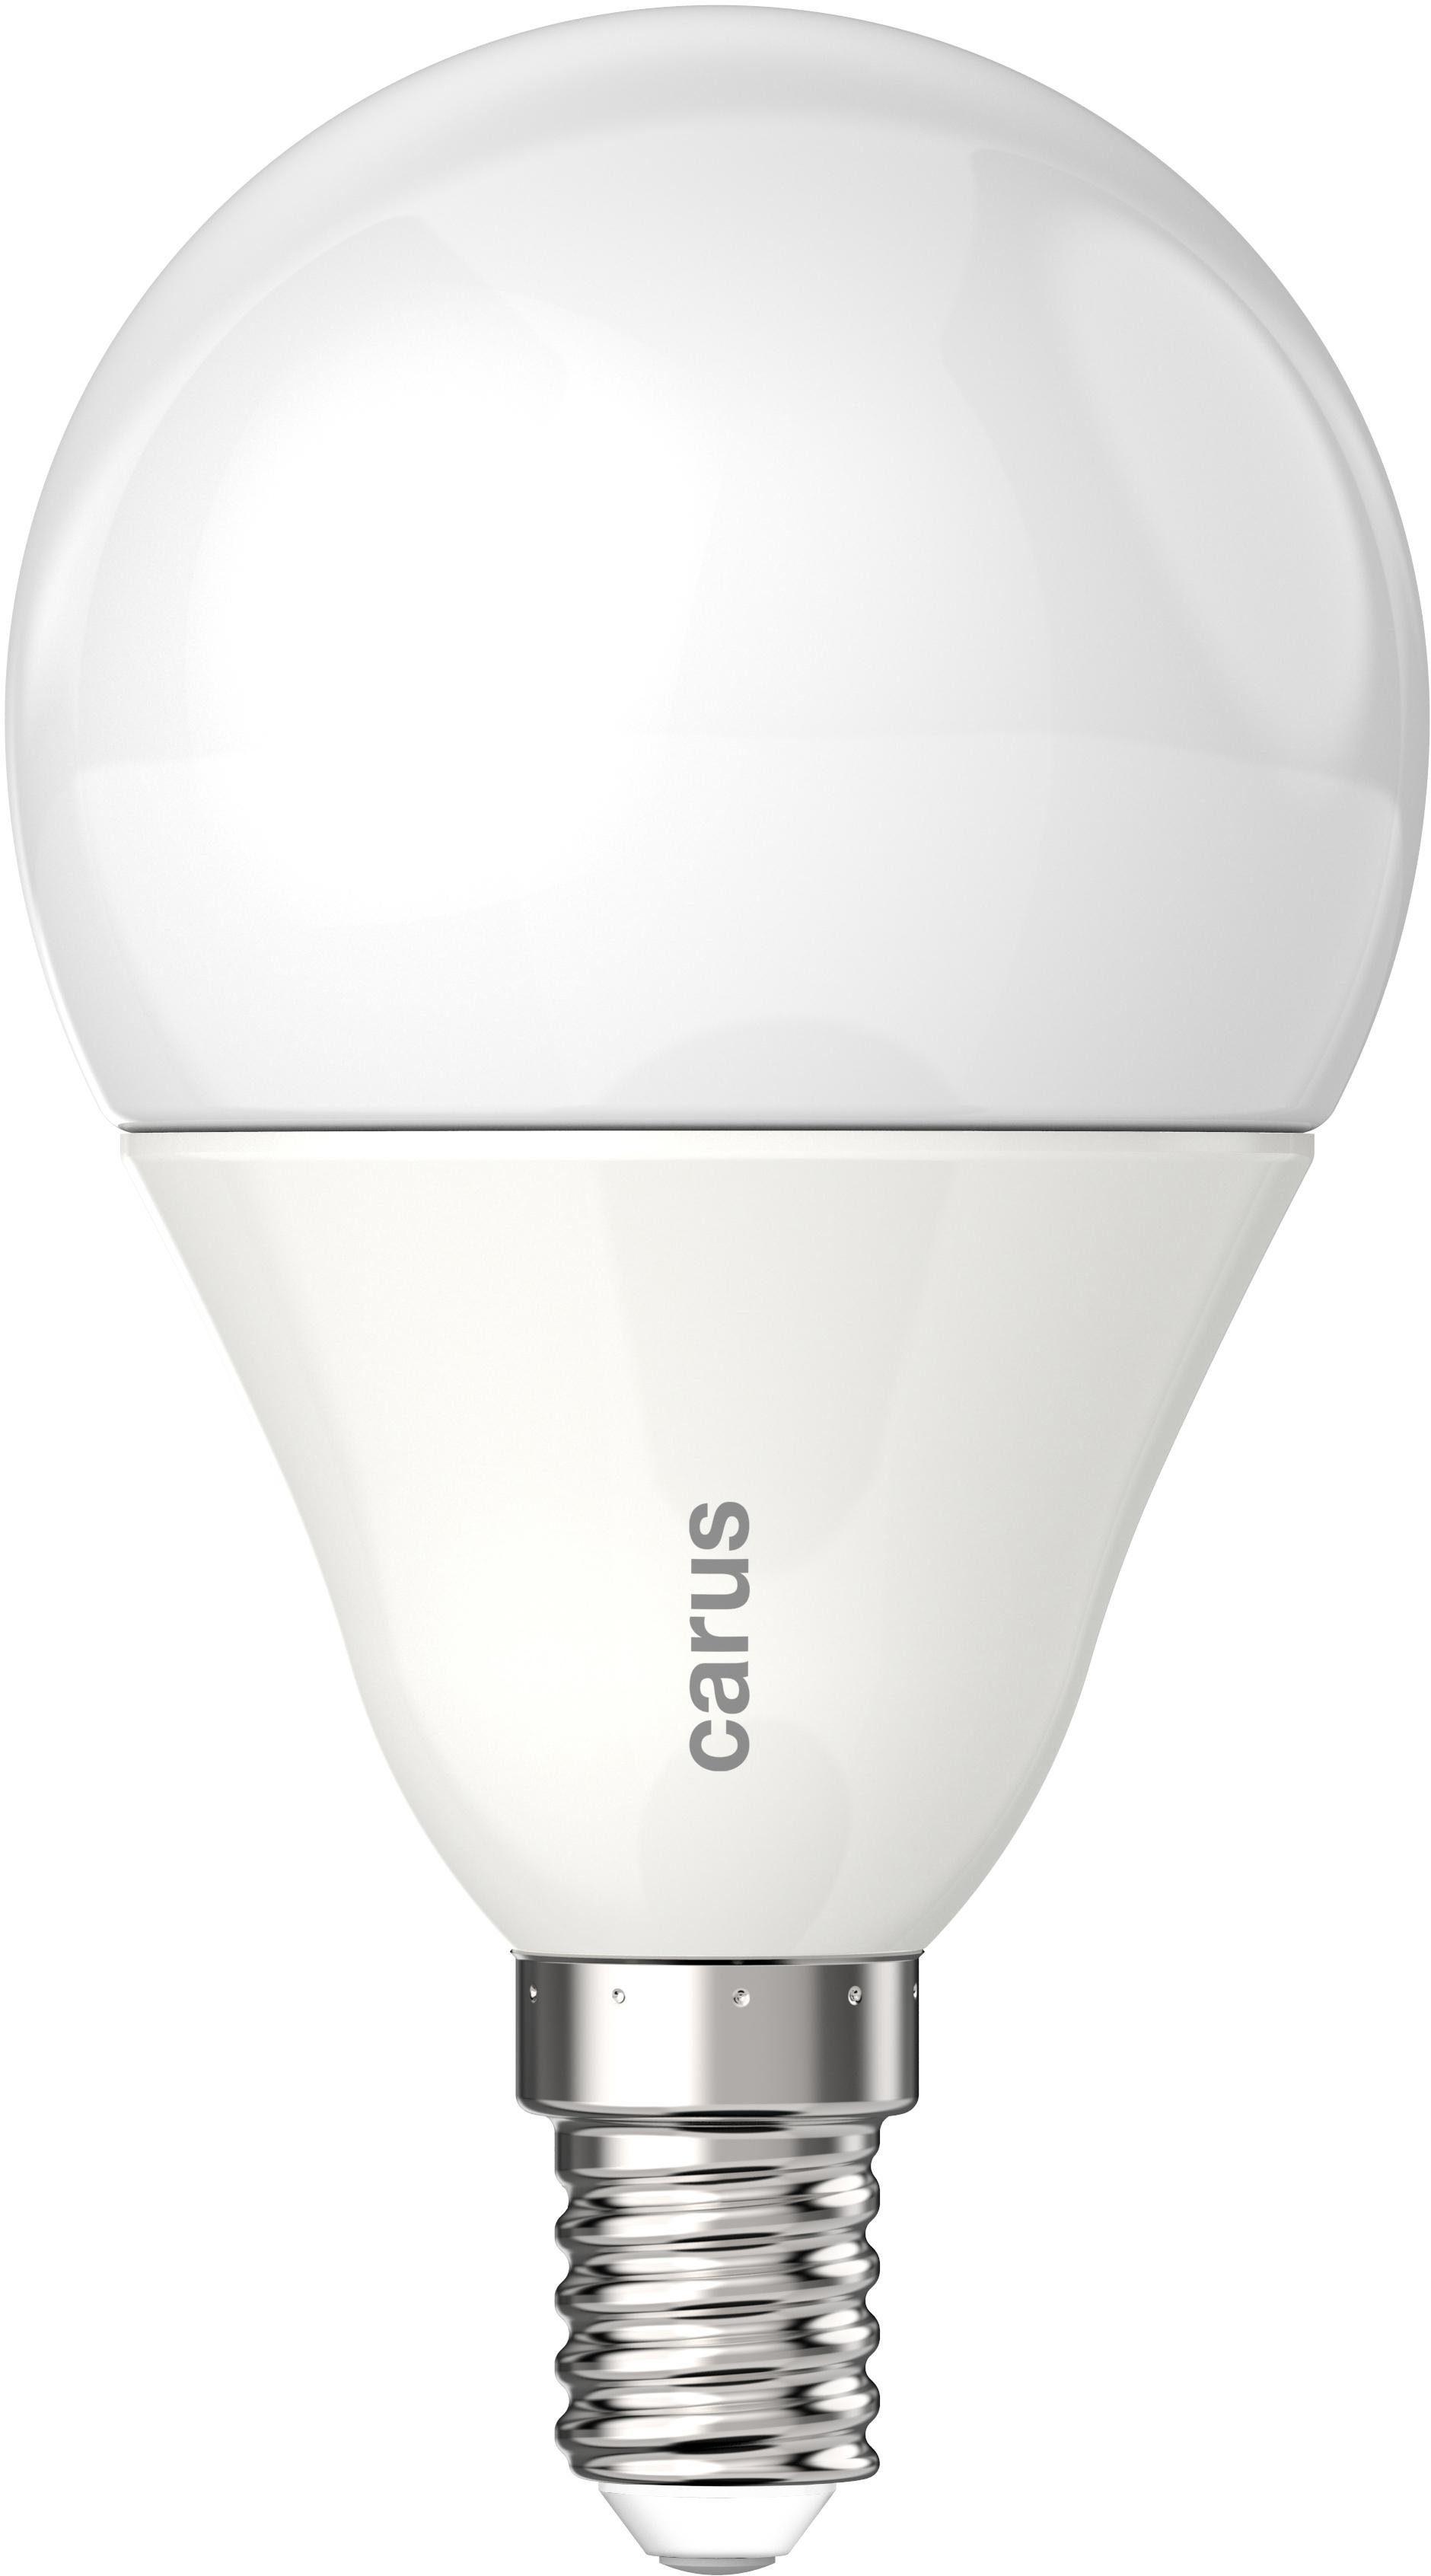 carus »Classic E14« LED-Leuchtmittel, E14, 2 Stück, Warmweiß